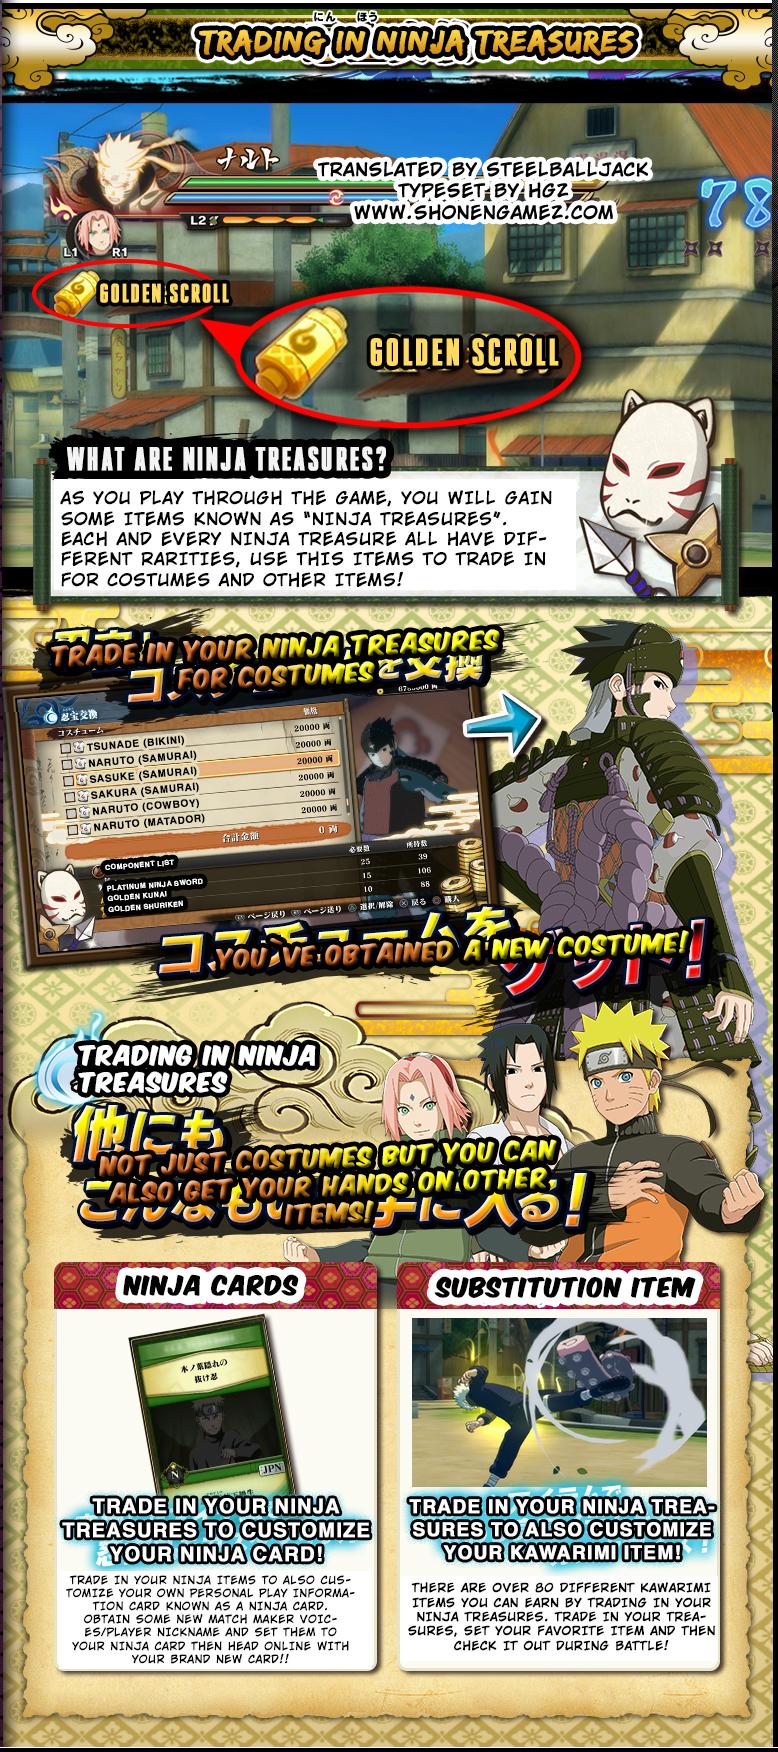 naruto-ultimate-ninja-storm-4-dettagli-tesori-01